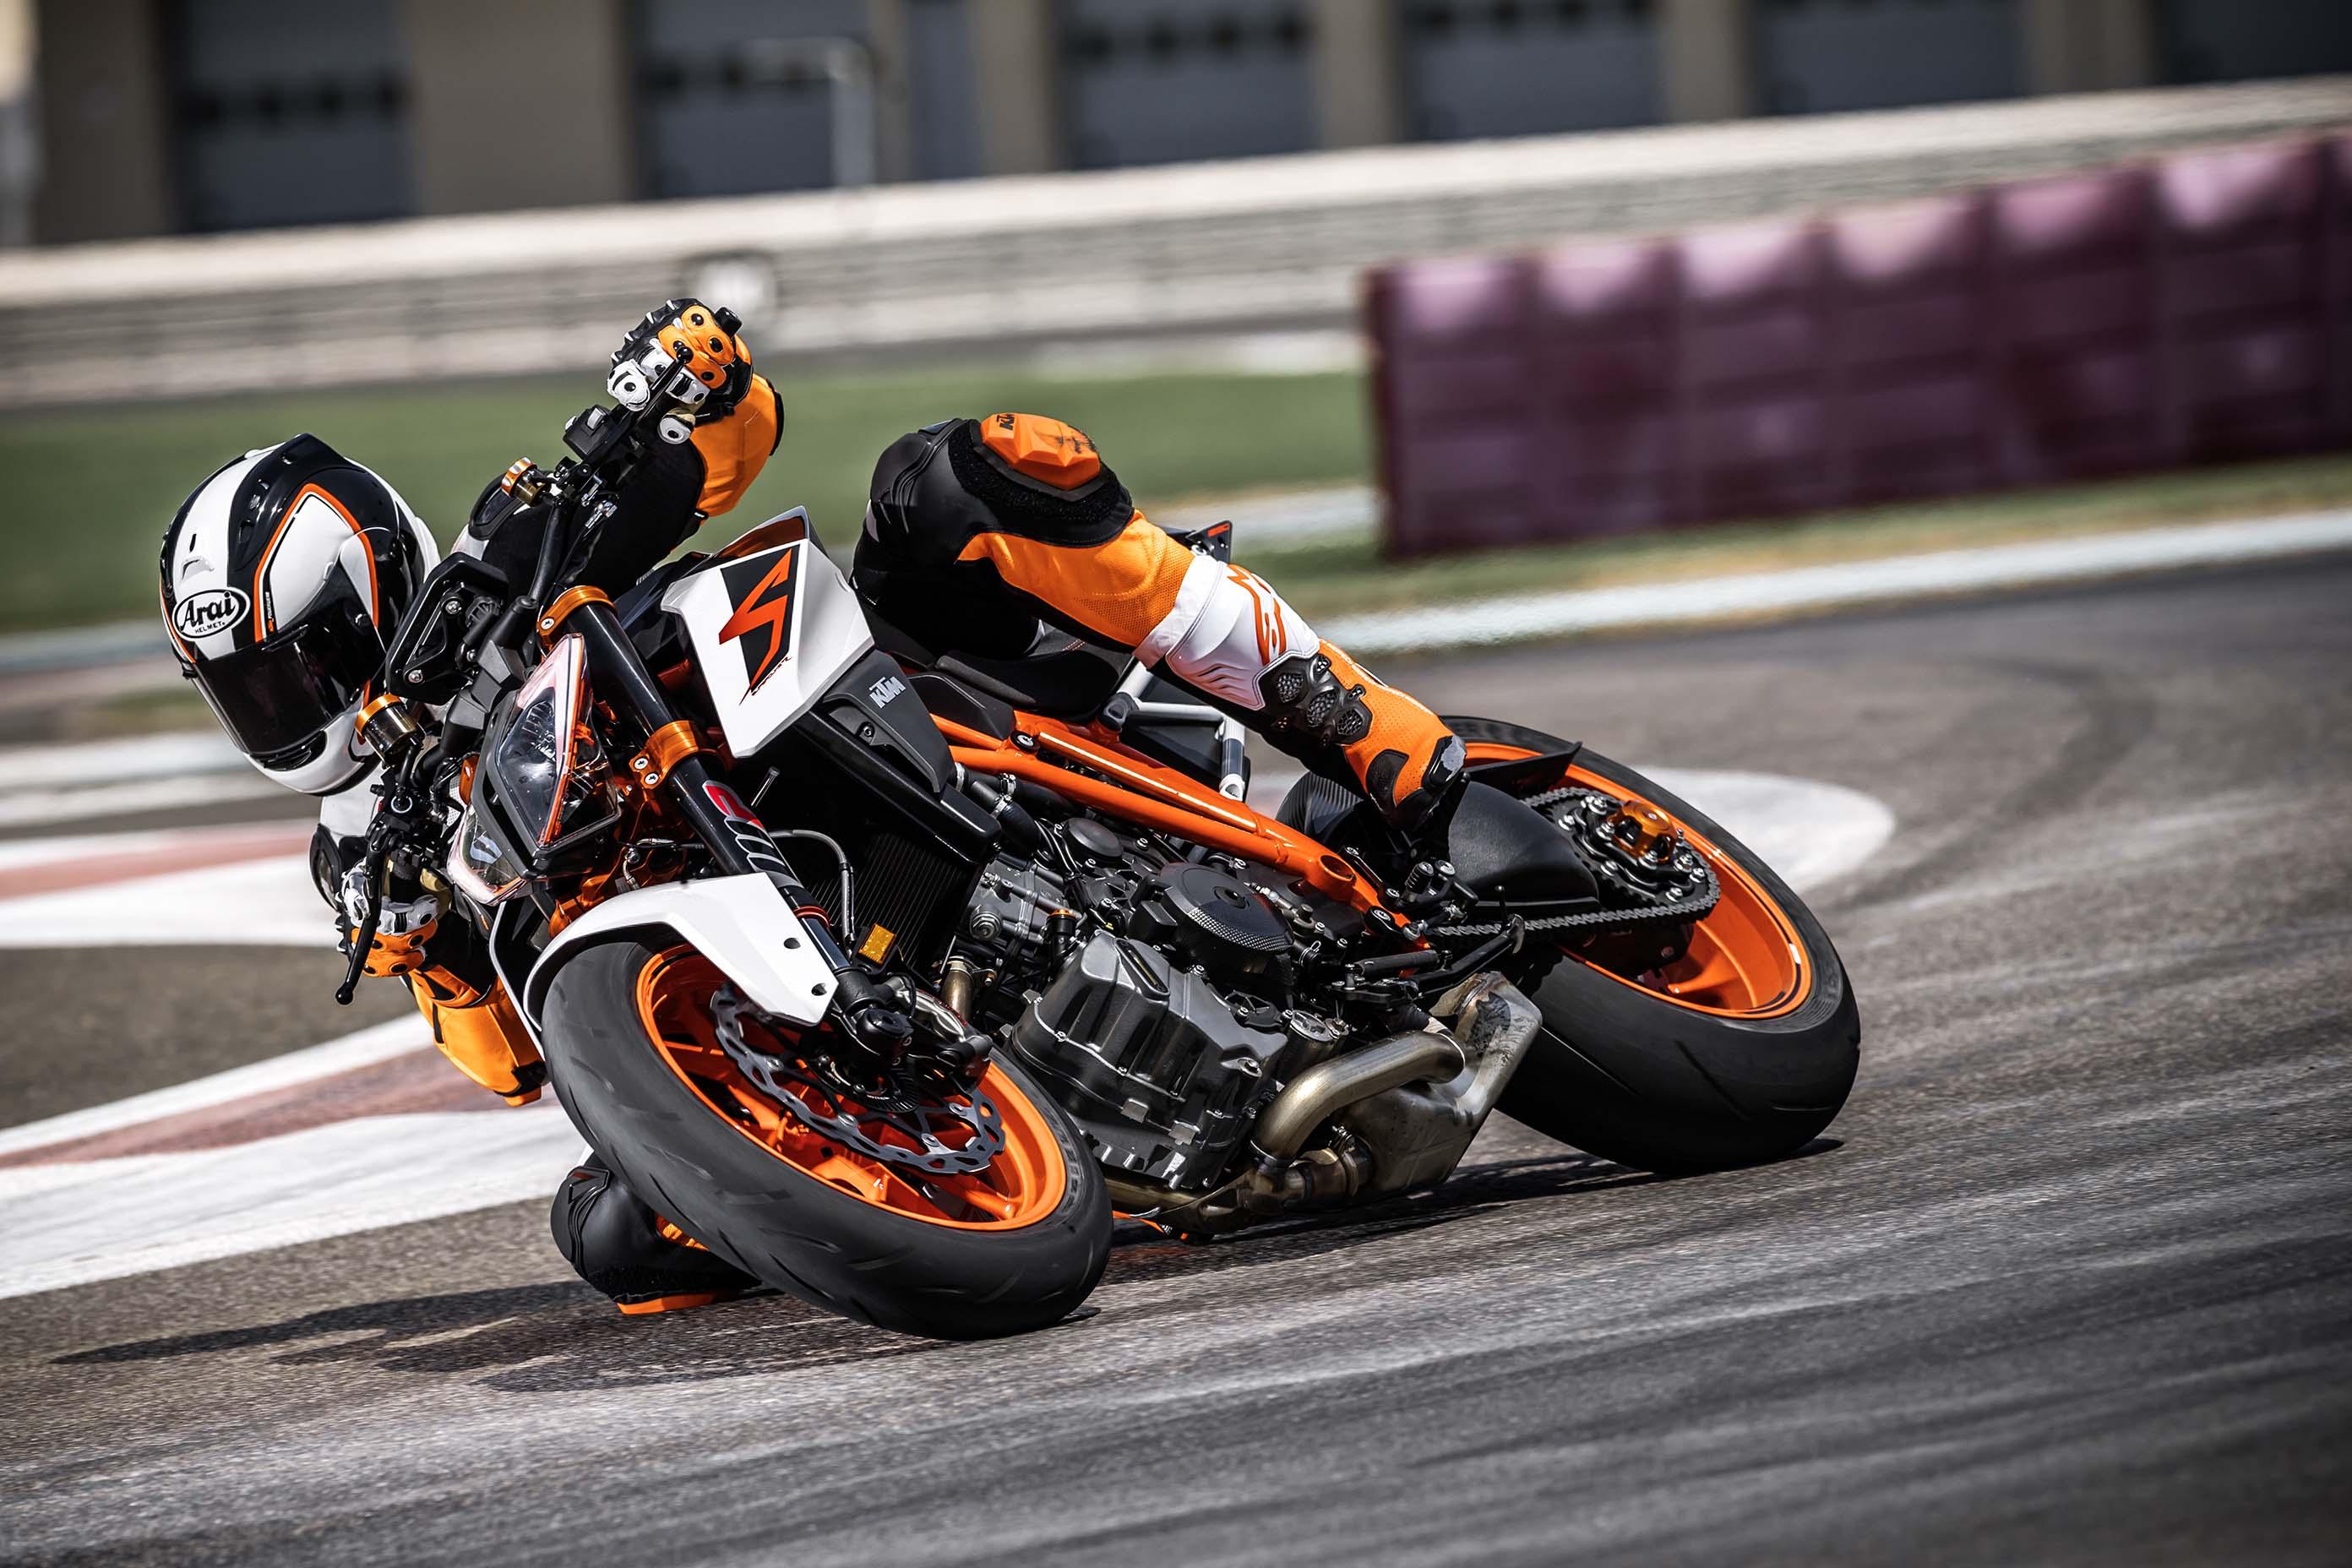 KTM 1290 Super Duke R Gets an Update for 2017